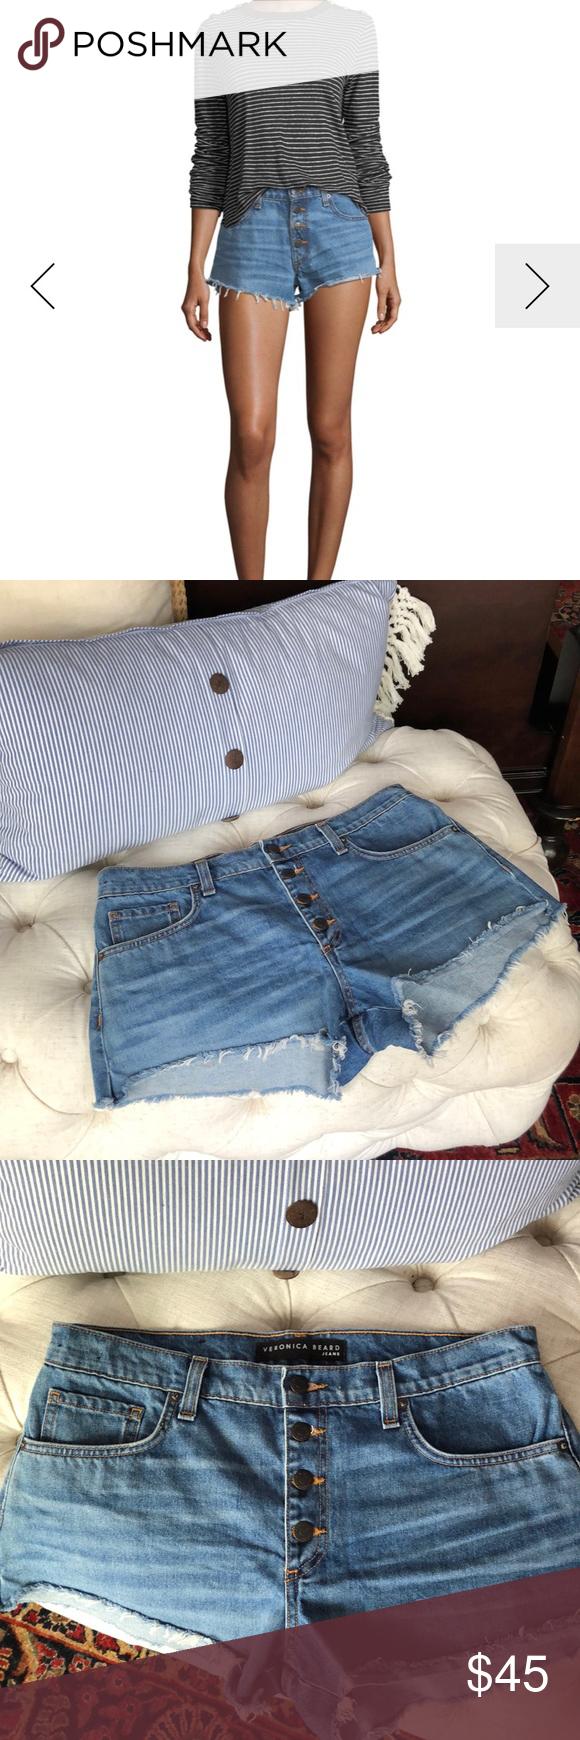 Veronica Beard Jean shorts New !! Never worn denim Cutoffs . So cute stylish. Button fly.  High waisted. Current sold Out!! Veronica Beard Shorts Jean Shorts #denimcutoffshorts